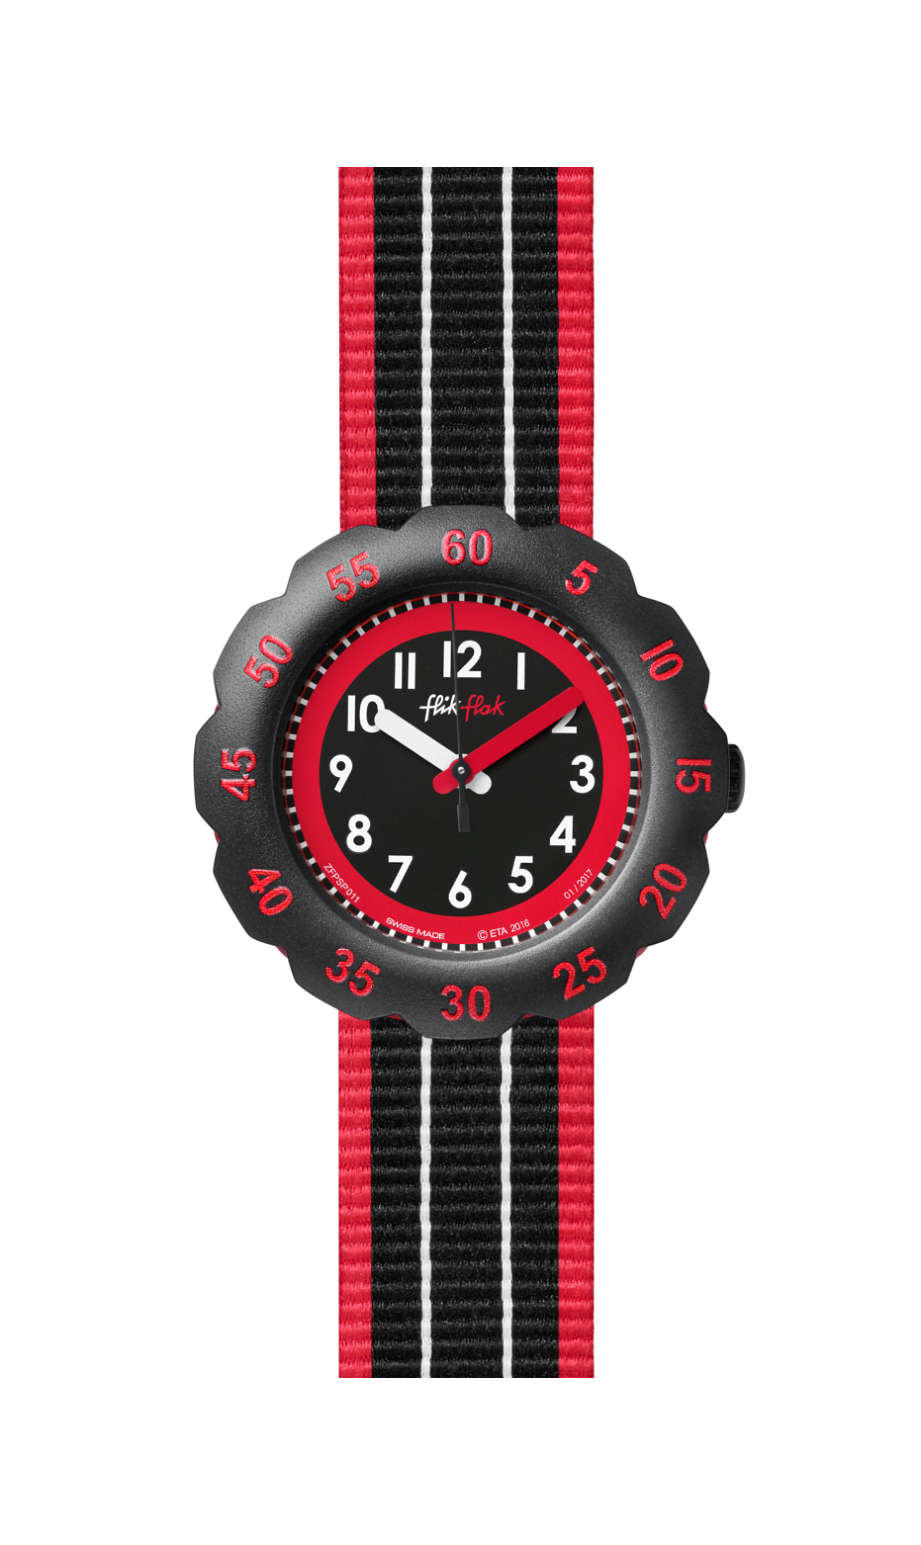 Swatch - BLACK STYLE - 1